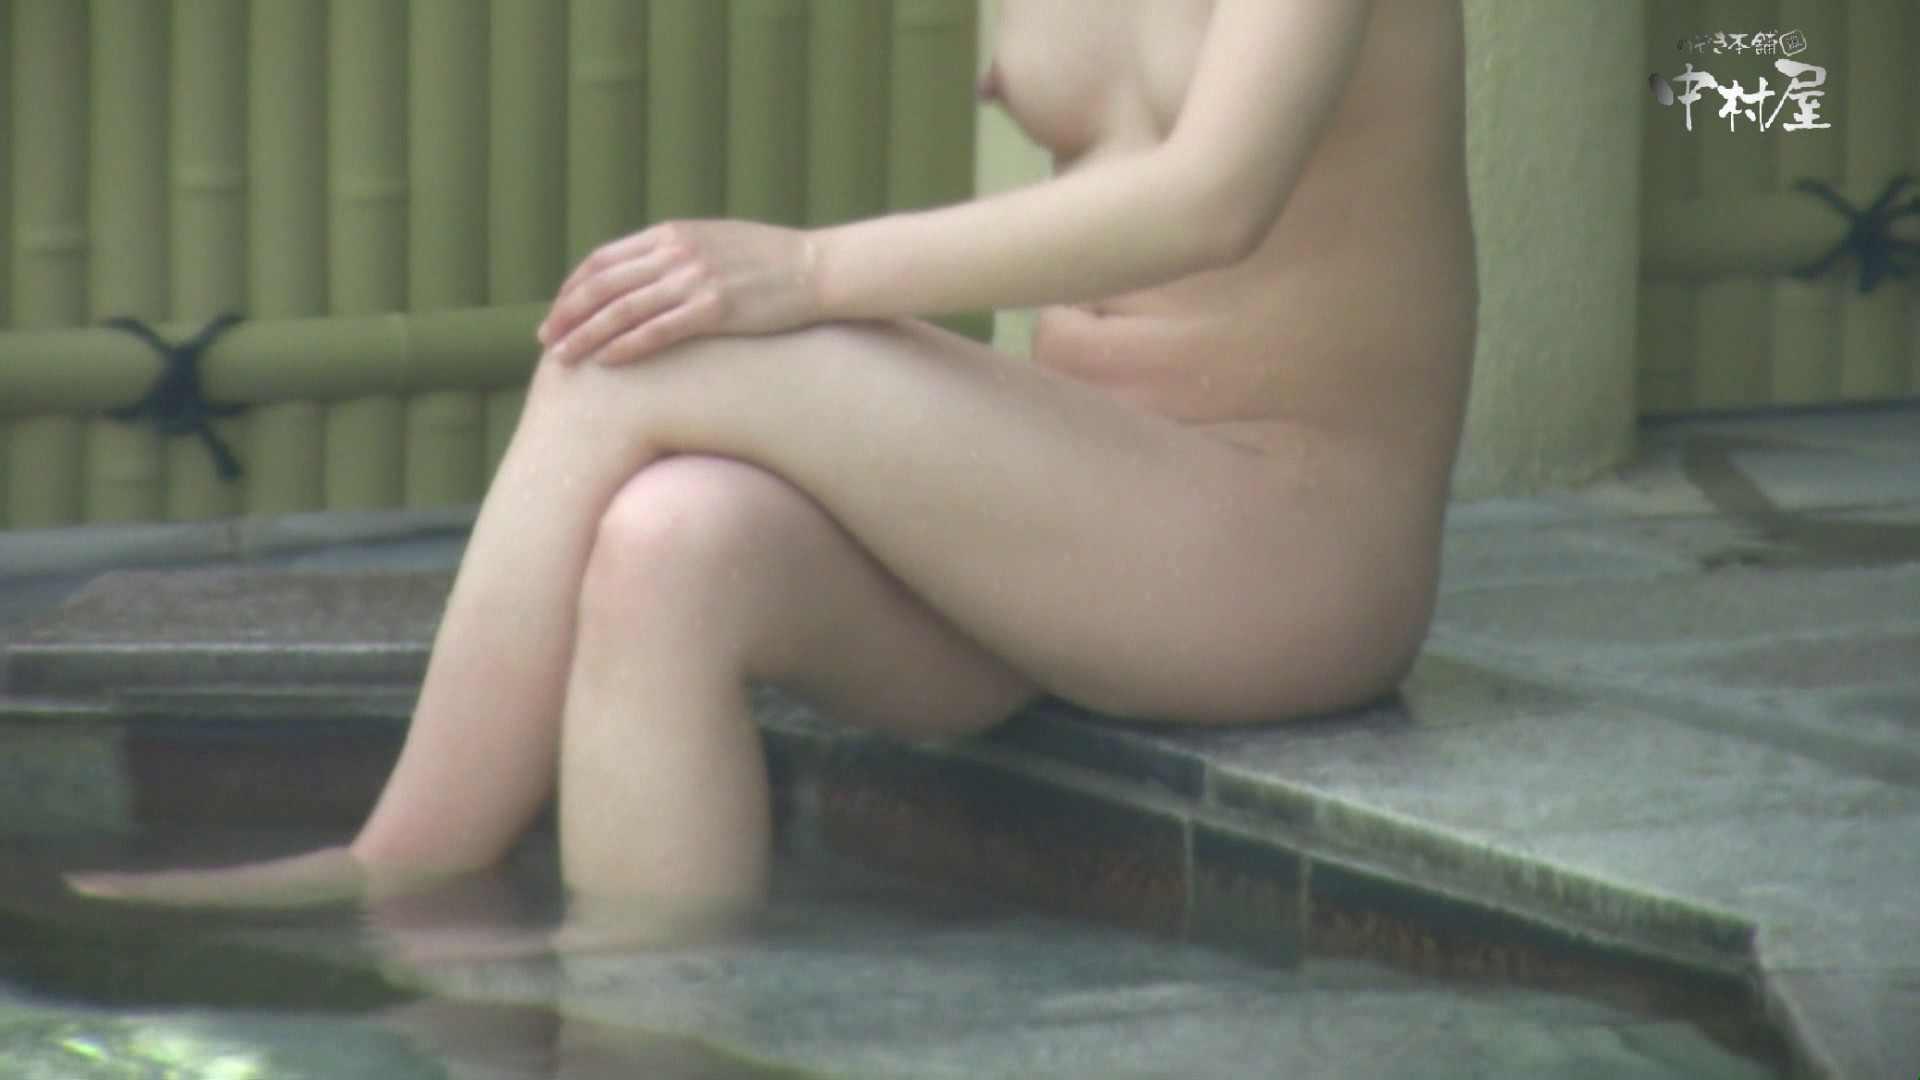 Aquaな露天風呂Vol.888 OLセックス   露天  77画像 64